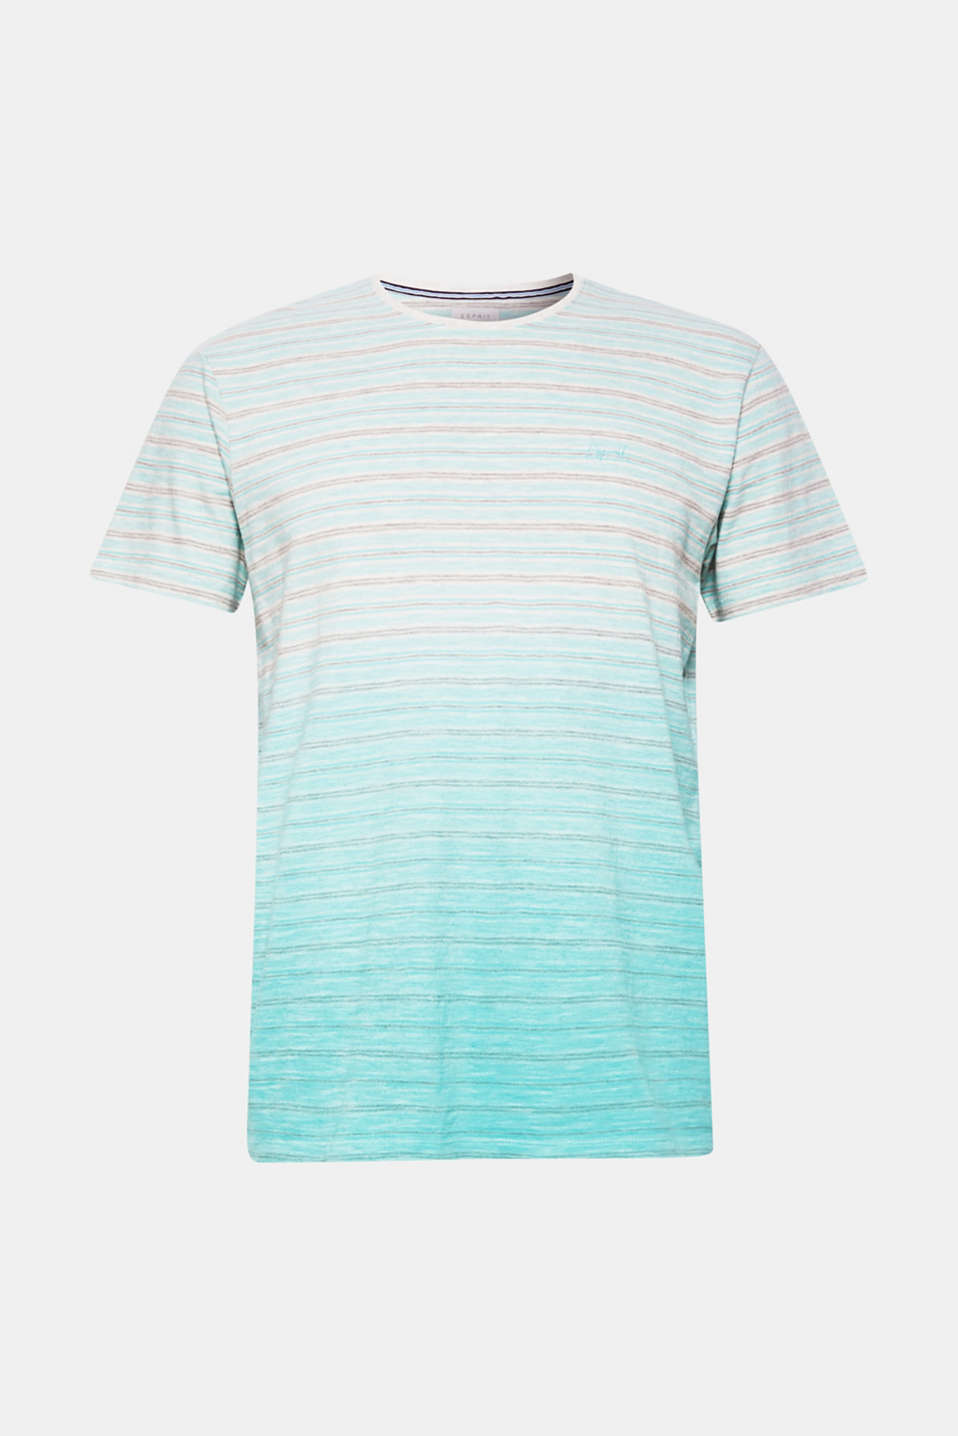 T-Shirts, LIGHT AQUA GREEN, detail image number 5